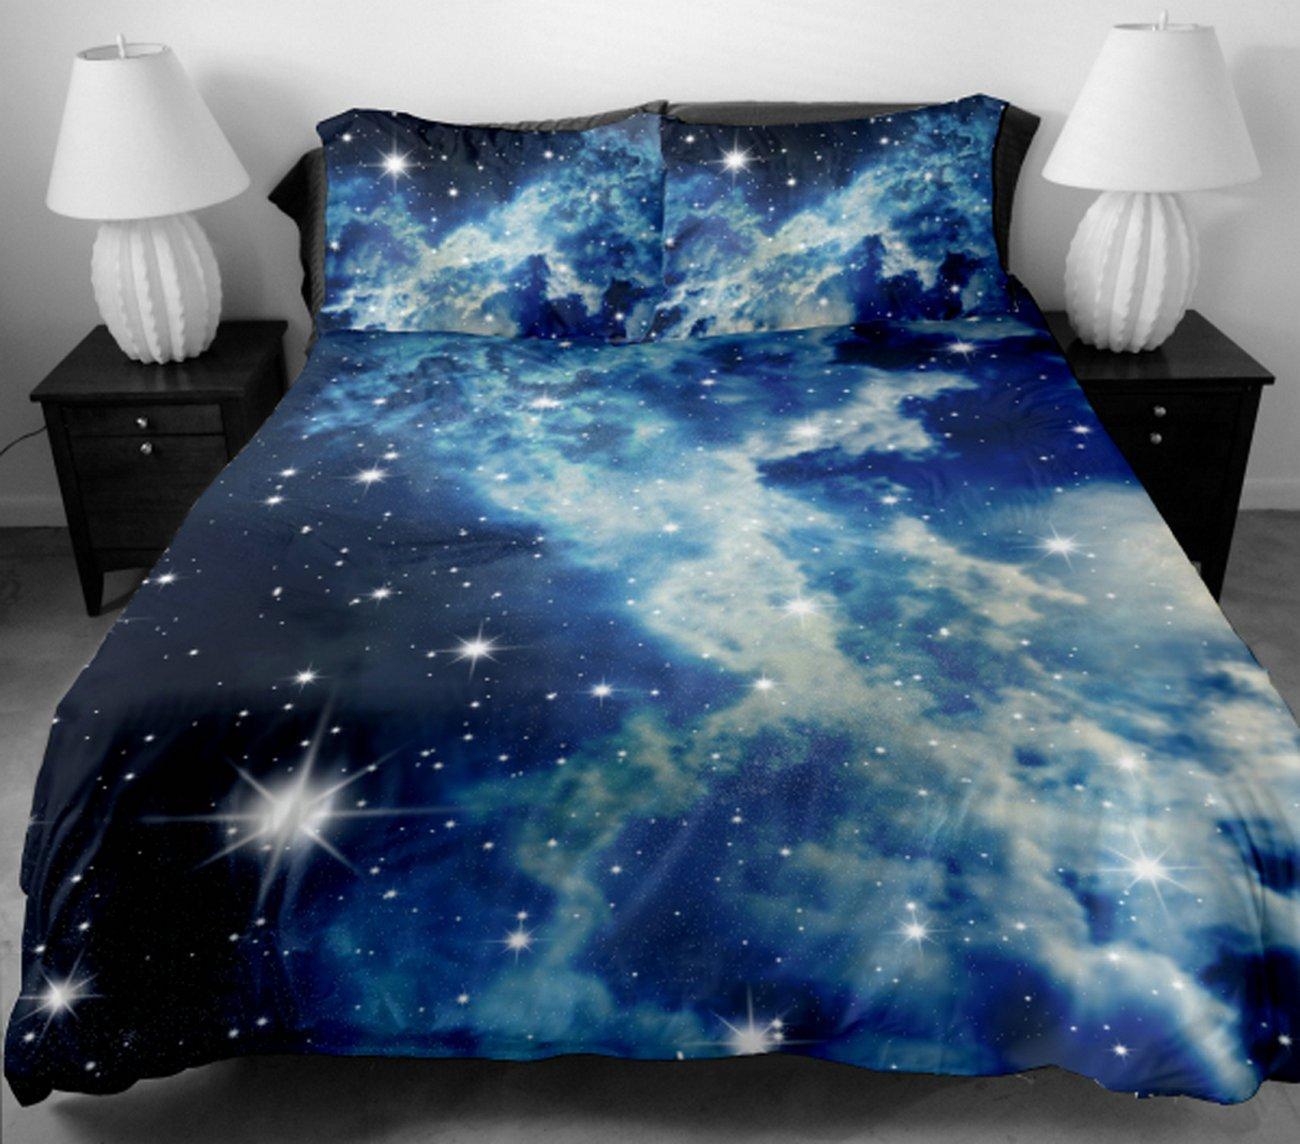 macys celestial original hotel from comforter bedding collection